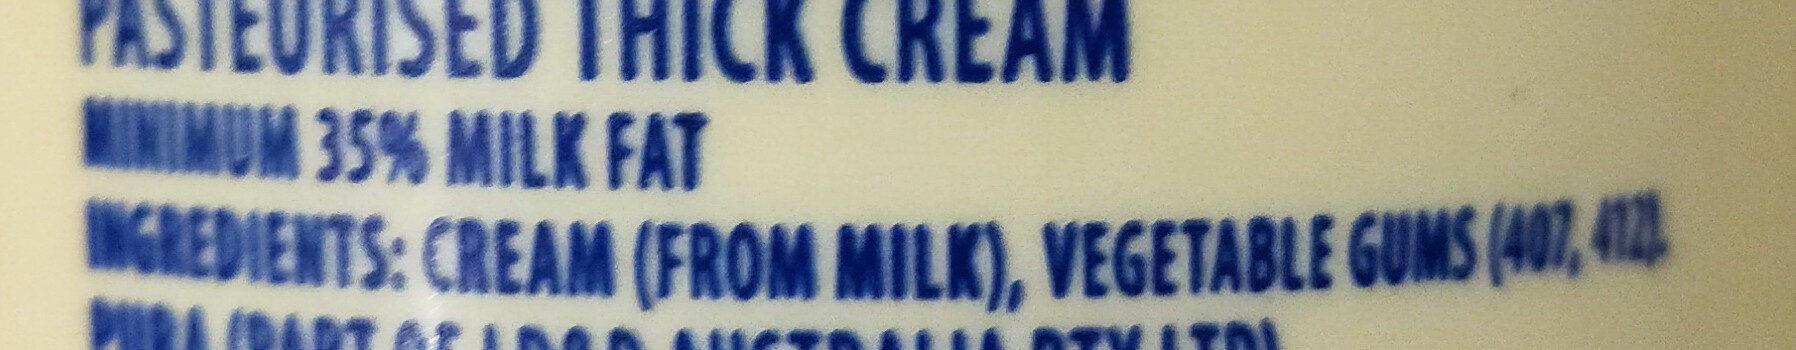 Thick Cream Dollop - Ingredients - en